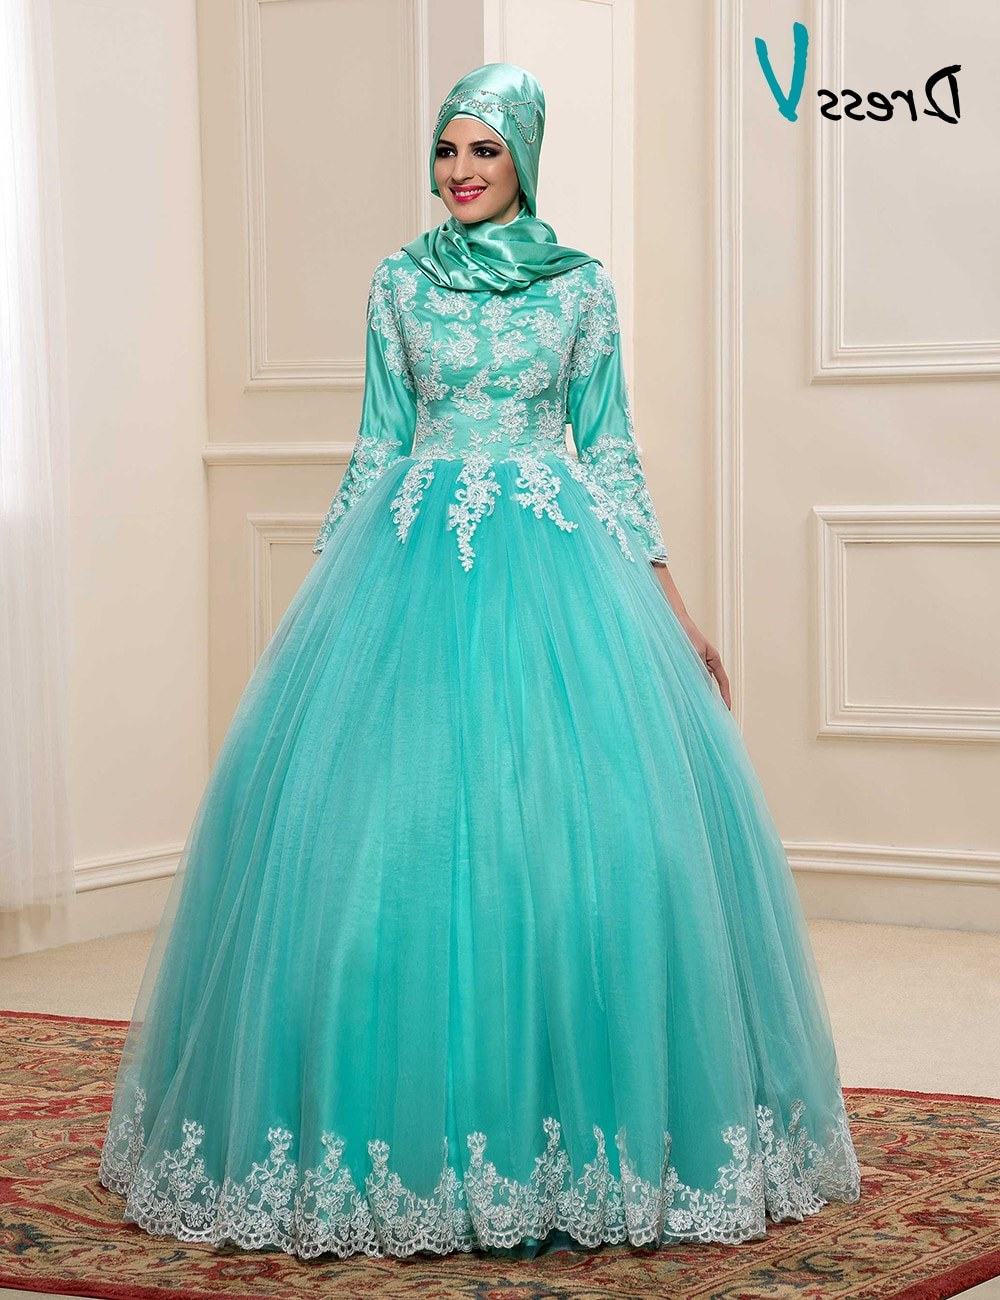 Inspirasi Baju Pengantin Muslimah Modern 2017 E9dx islamic Hijab Wedding Dresses – Fashion Dresses